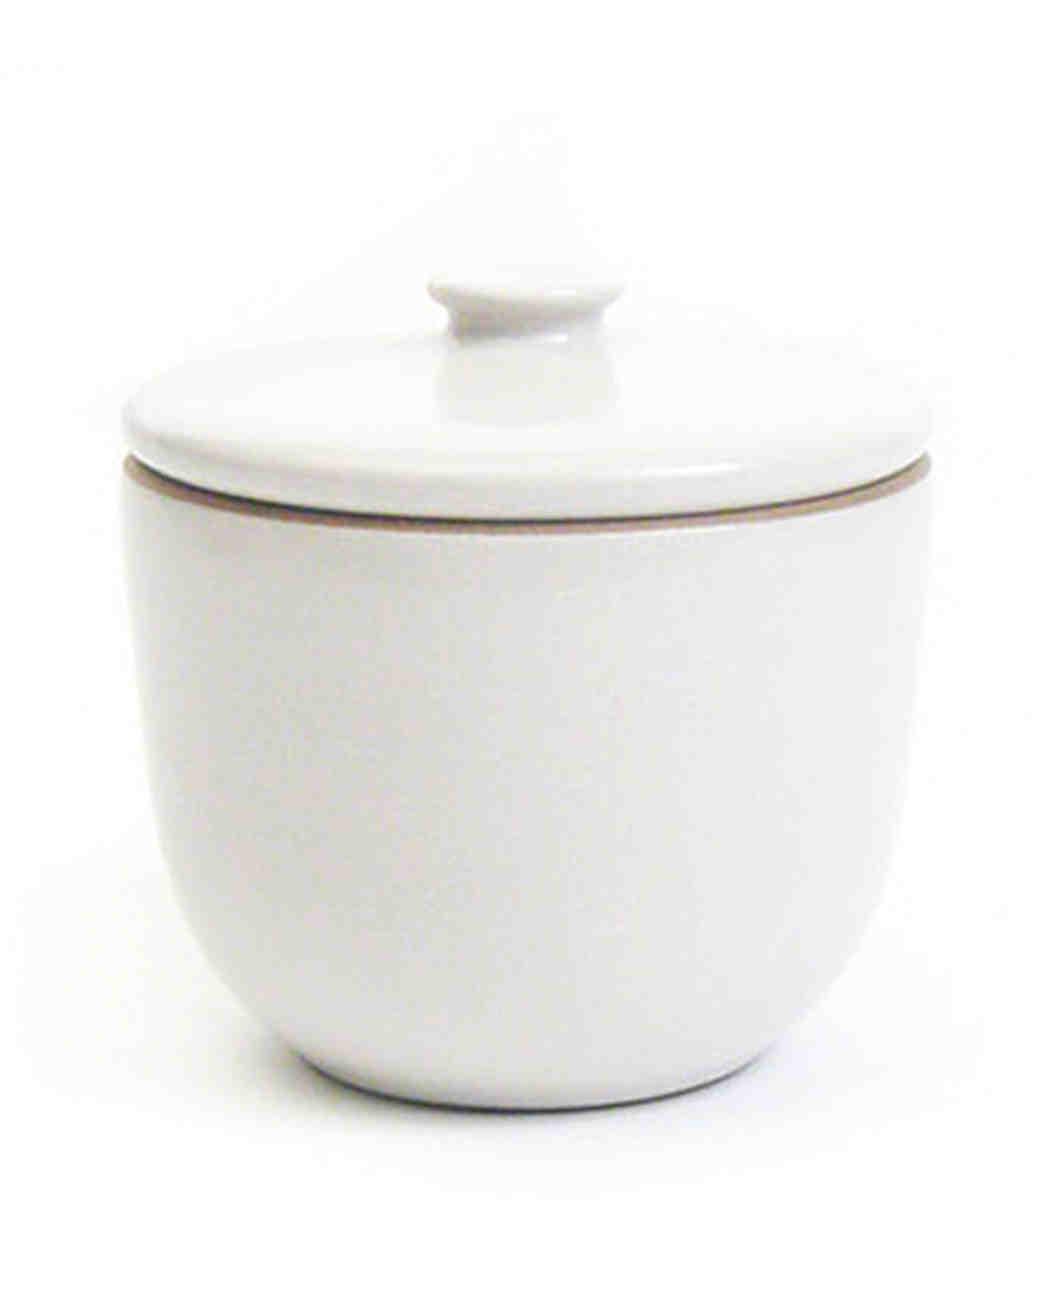 breakfast-bed-blueprint-sugar-bowl-0215.jpg